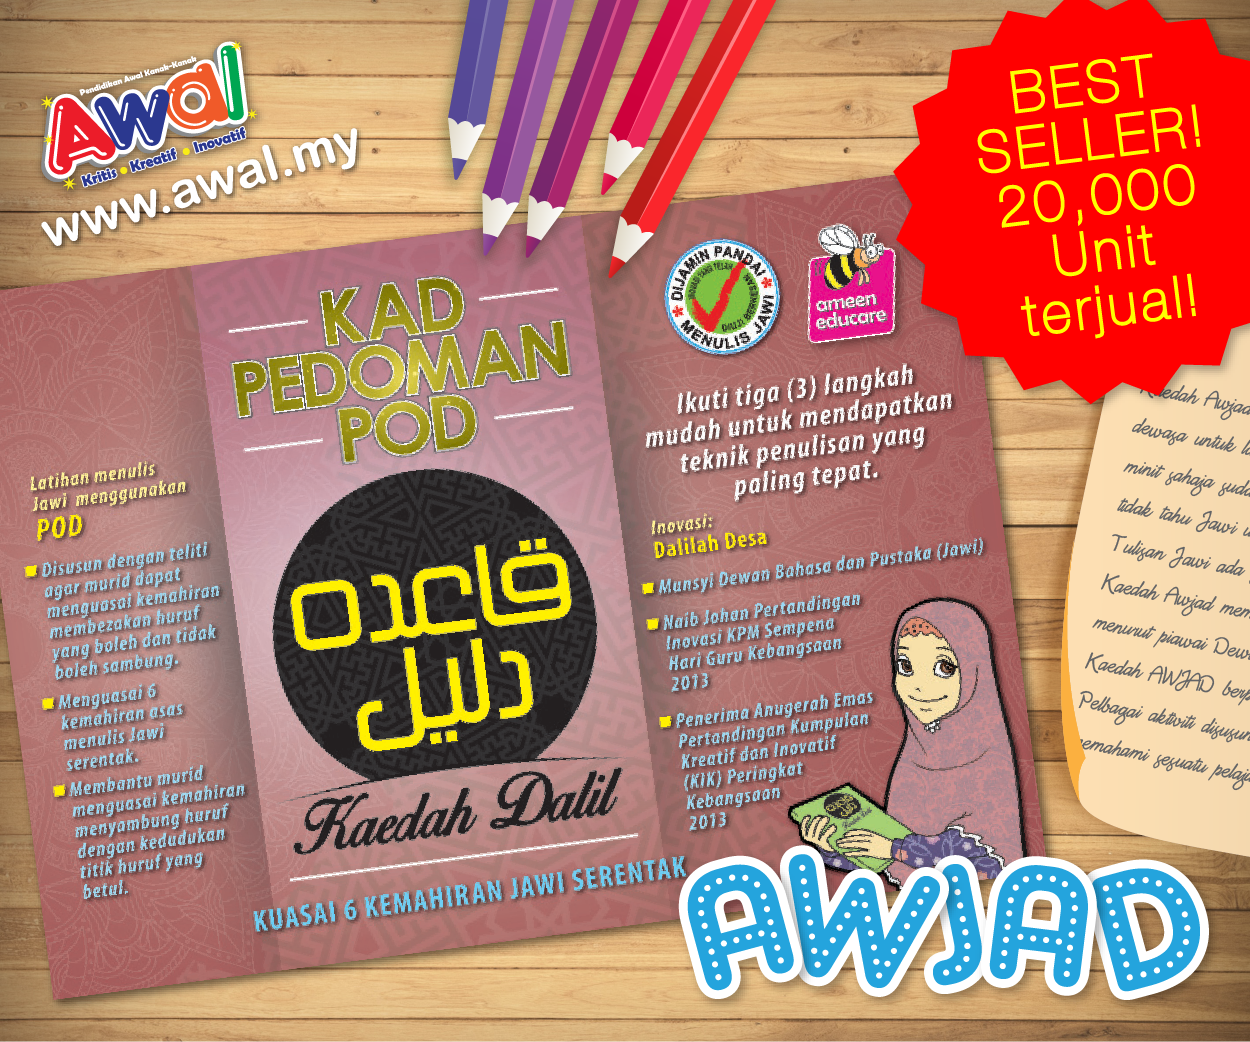 AWJAD - Best Seller (2018)-01